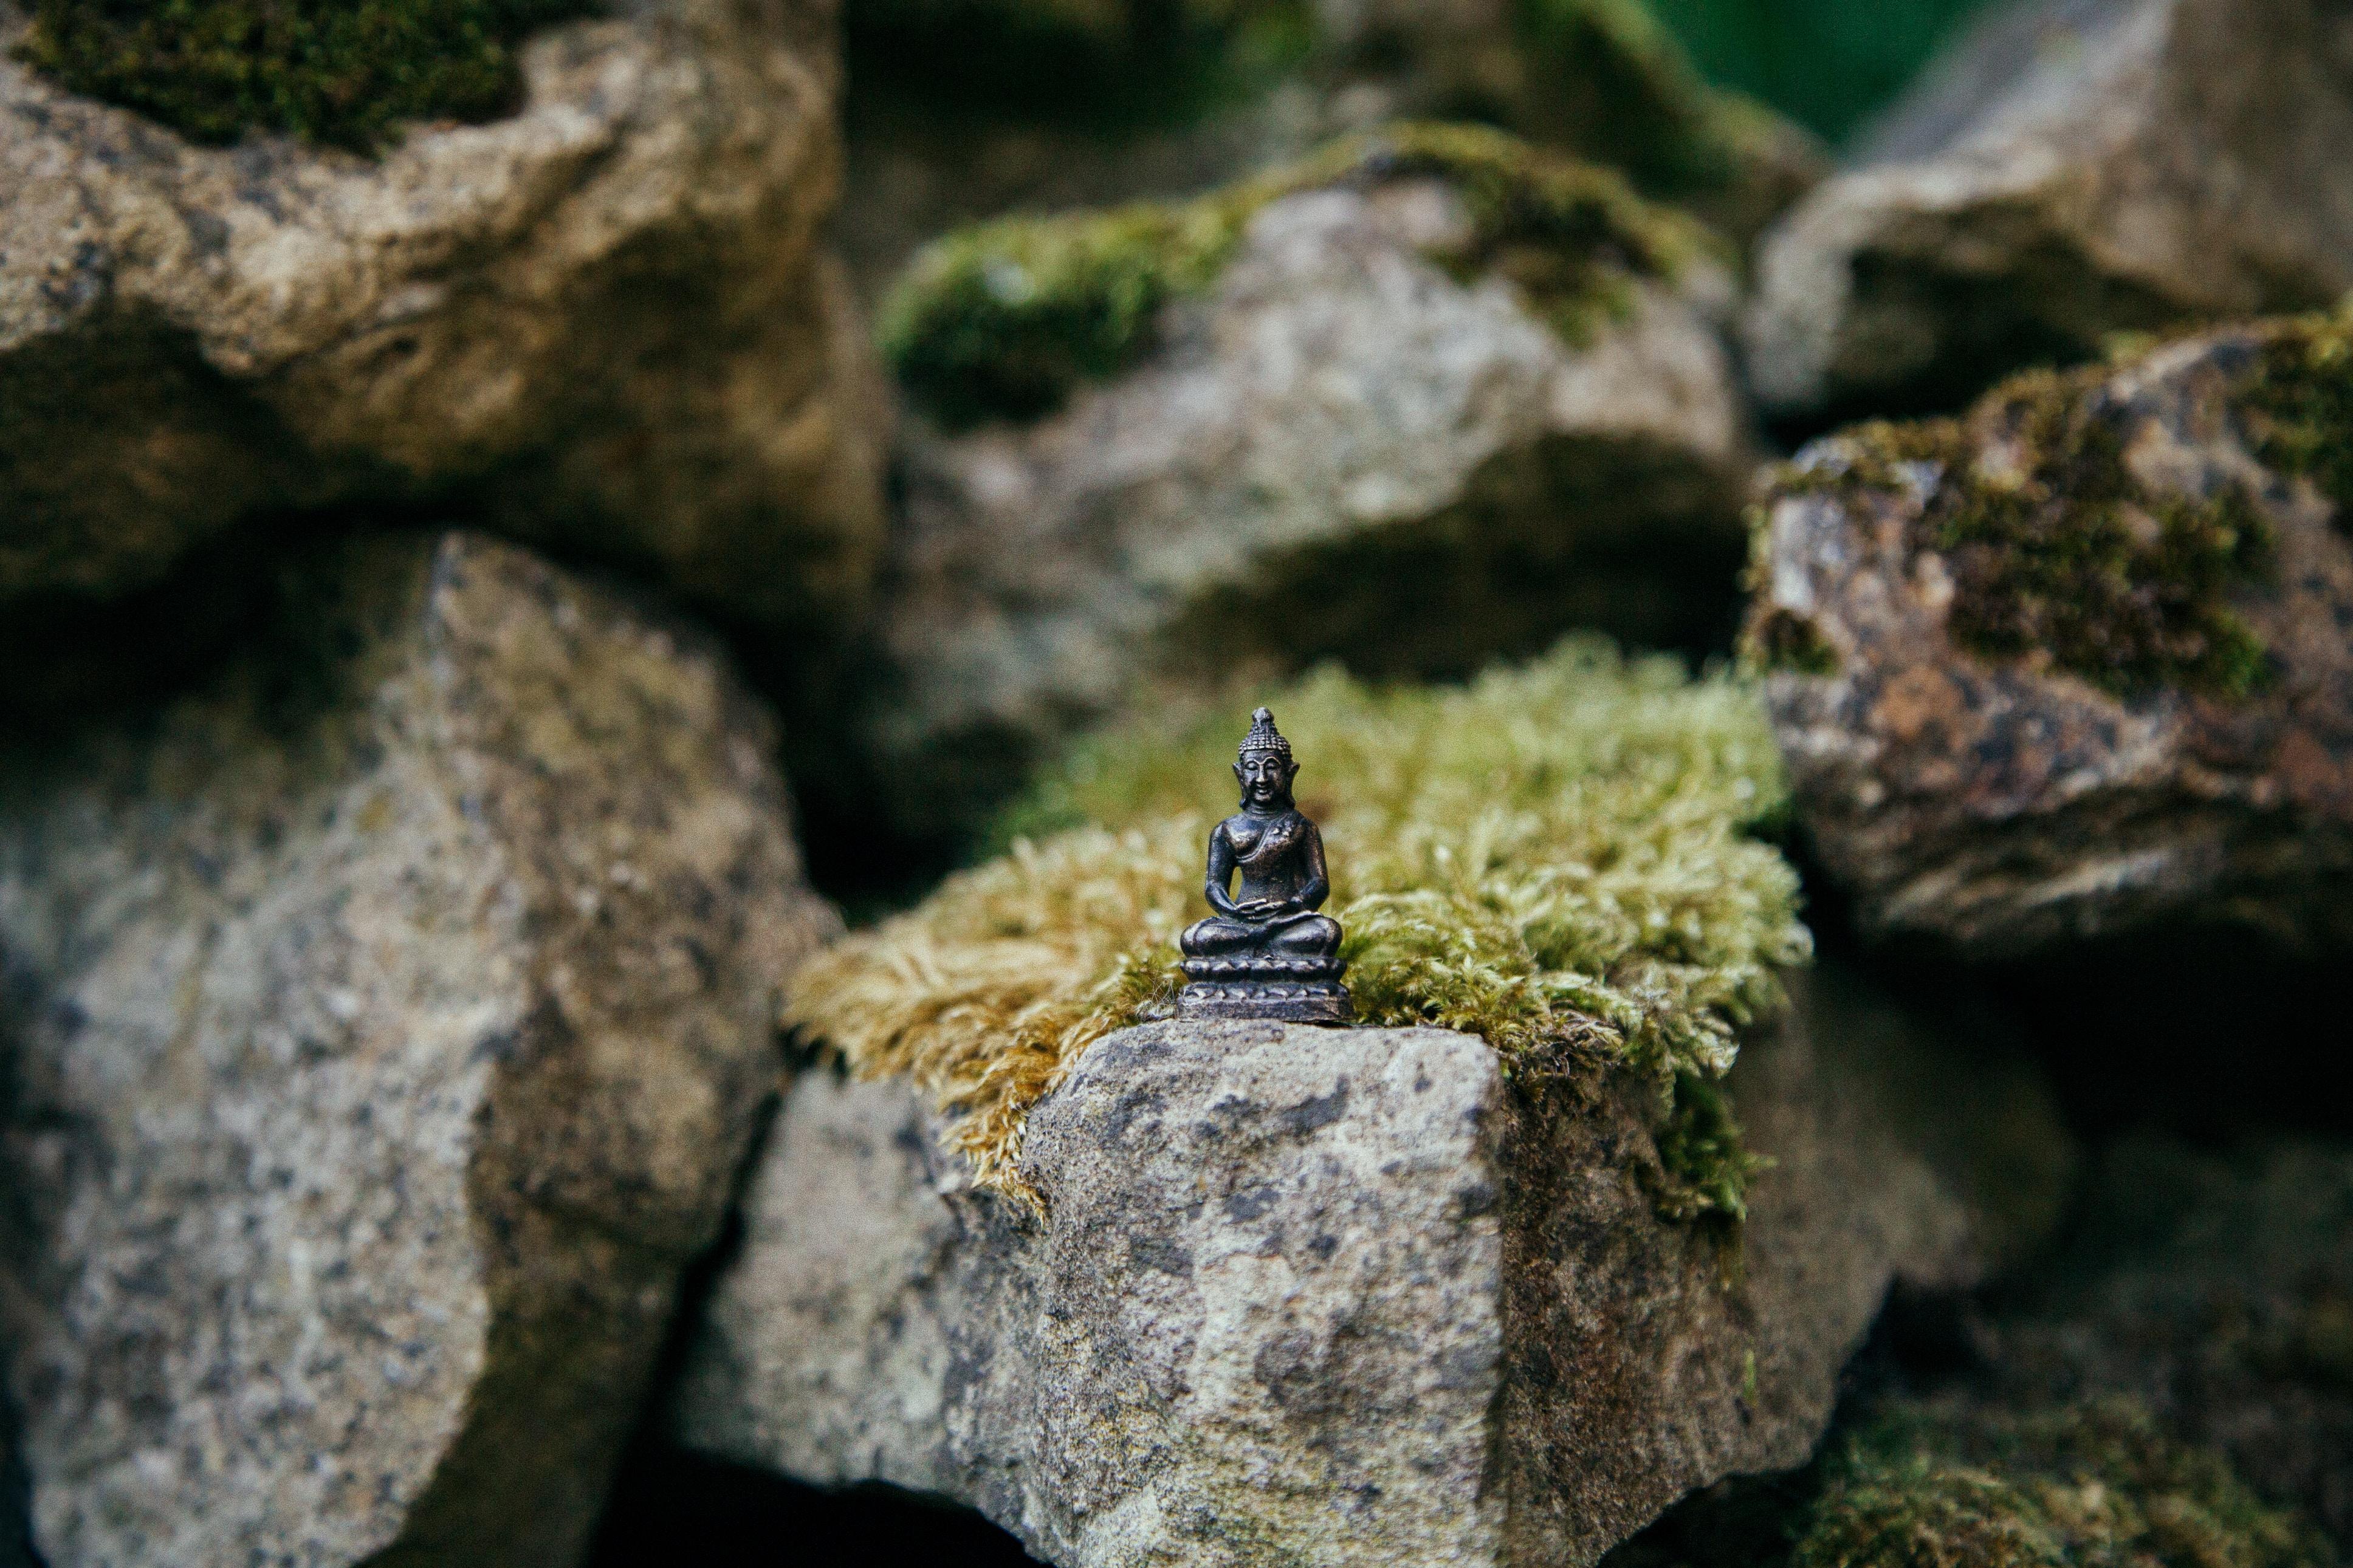 Relax More - Wat Boeddha bedoelde met Mindfulness